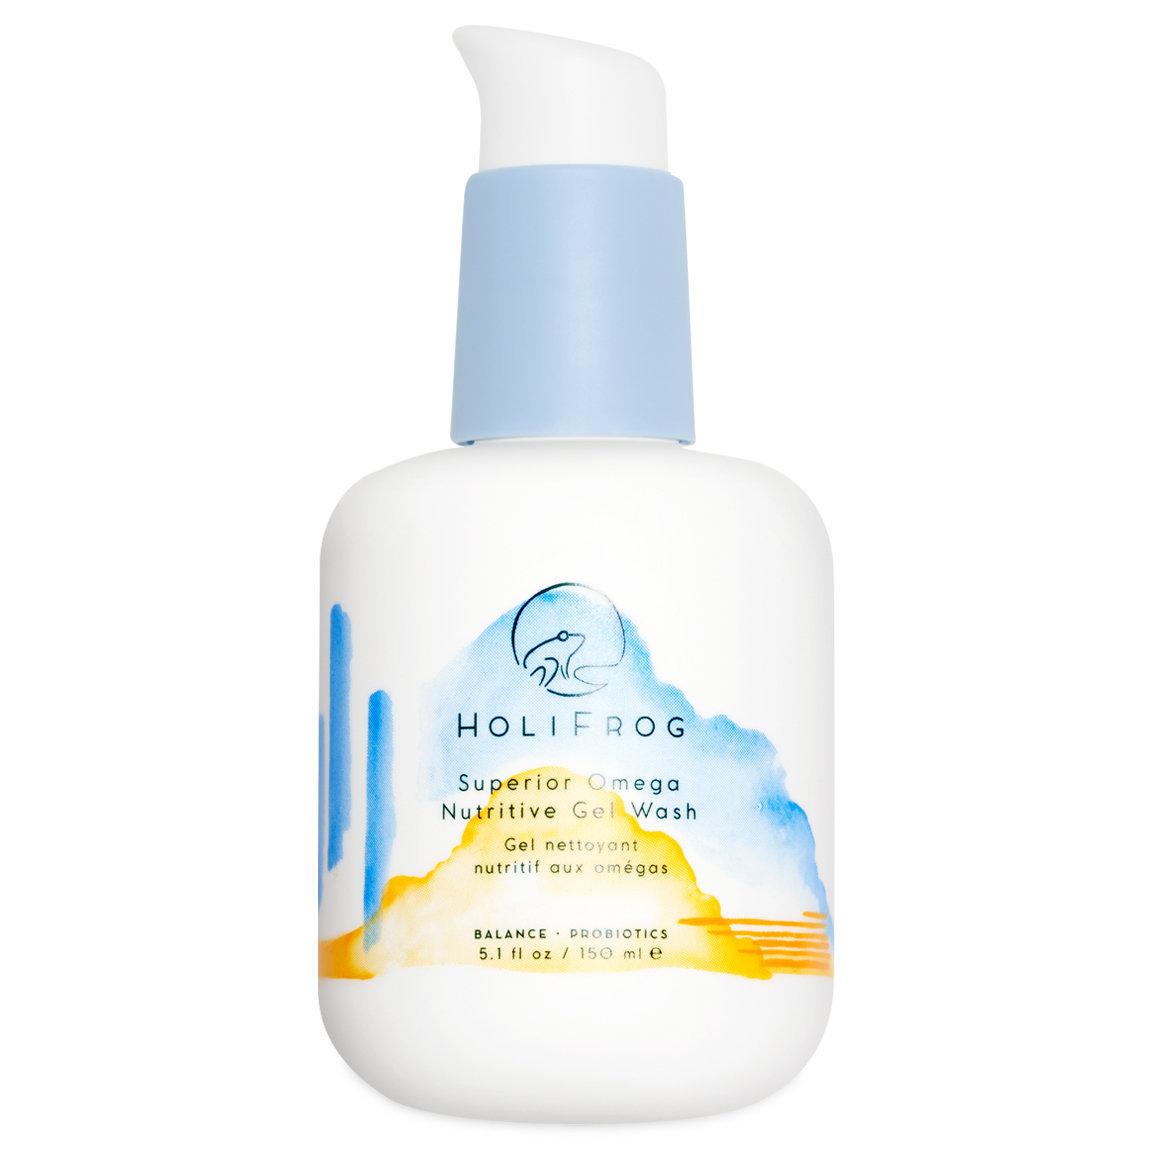 HoliFrog Superior Omega Nutritive Gel Wash alternative view 1 - product swatch.